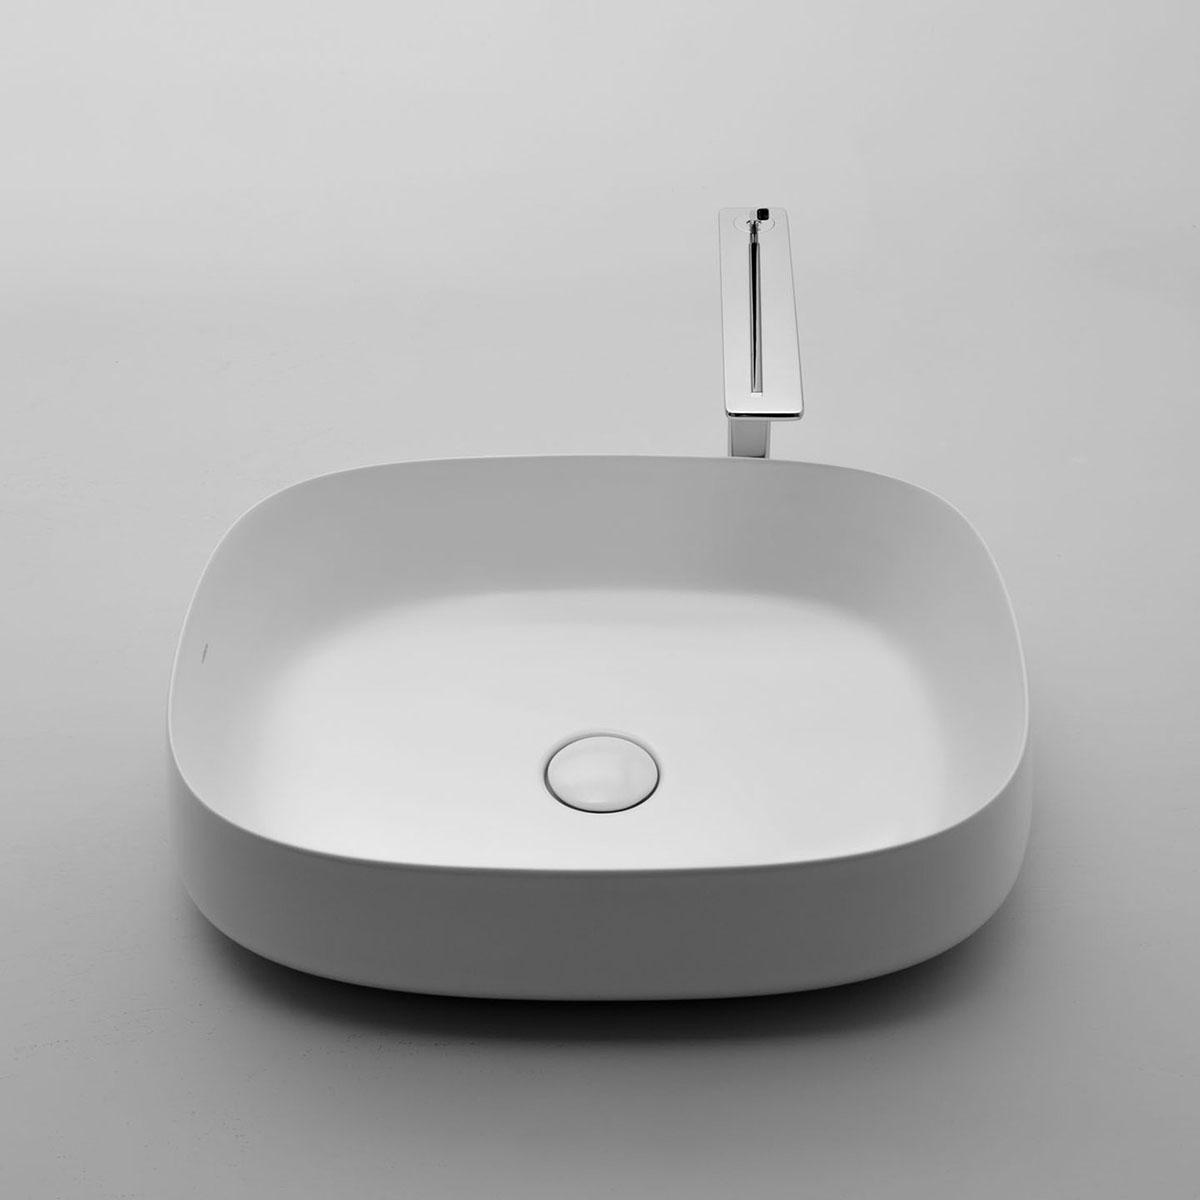 Seed 55.42 - SEL02 Bathroom Sink